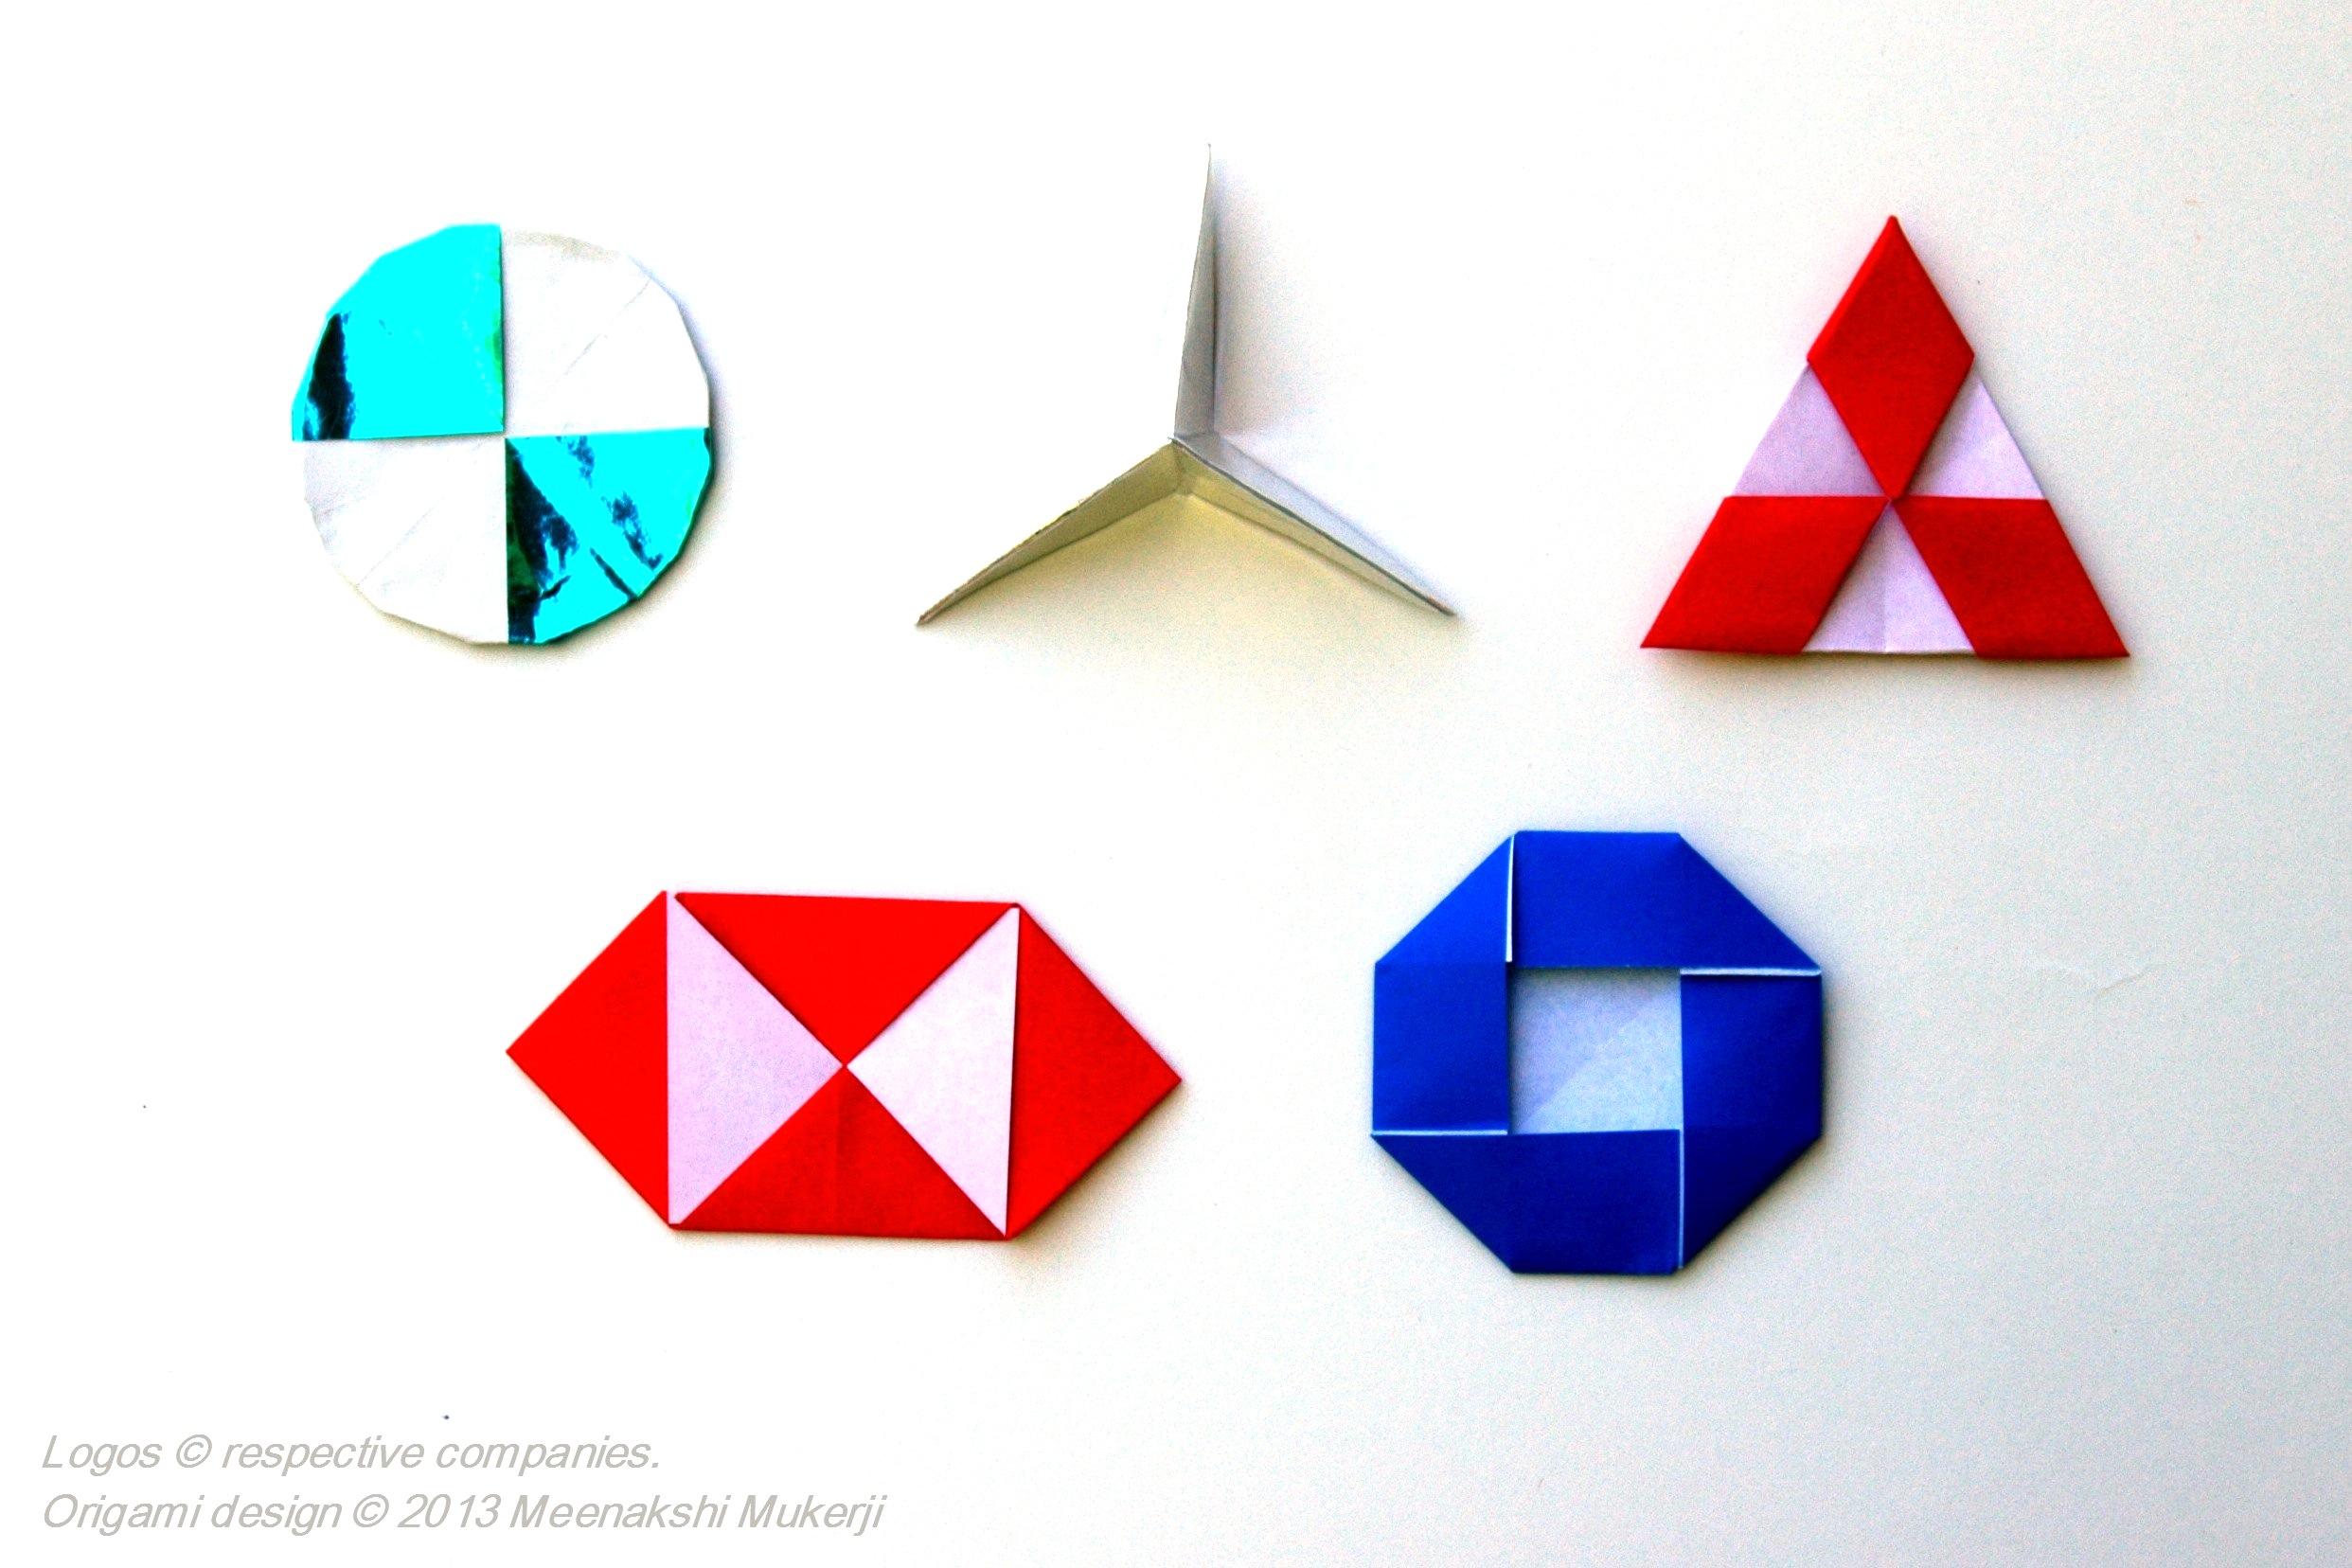 Company Logos in Pureland Origami - Meenakshi Mukerji ... - photo#9